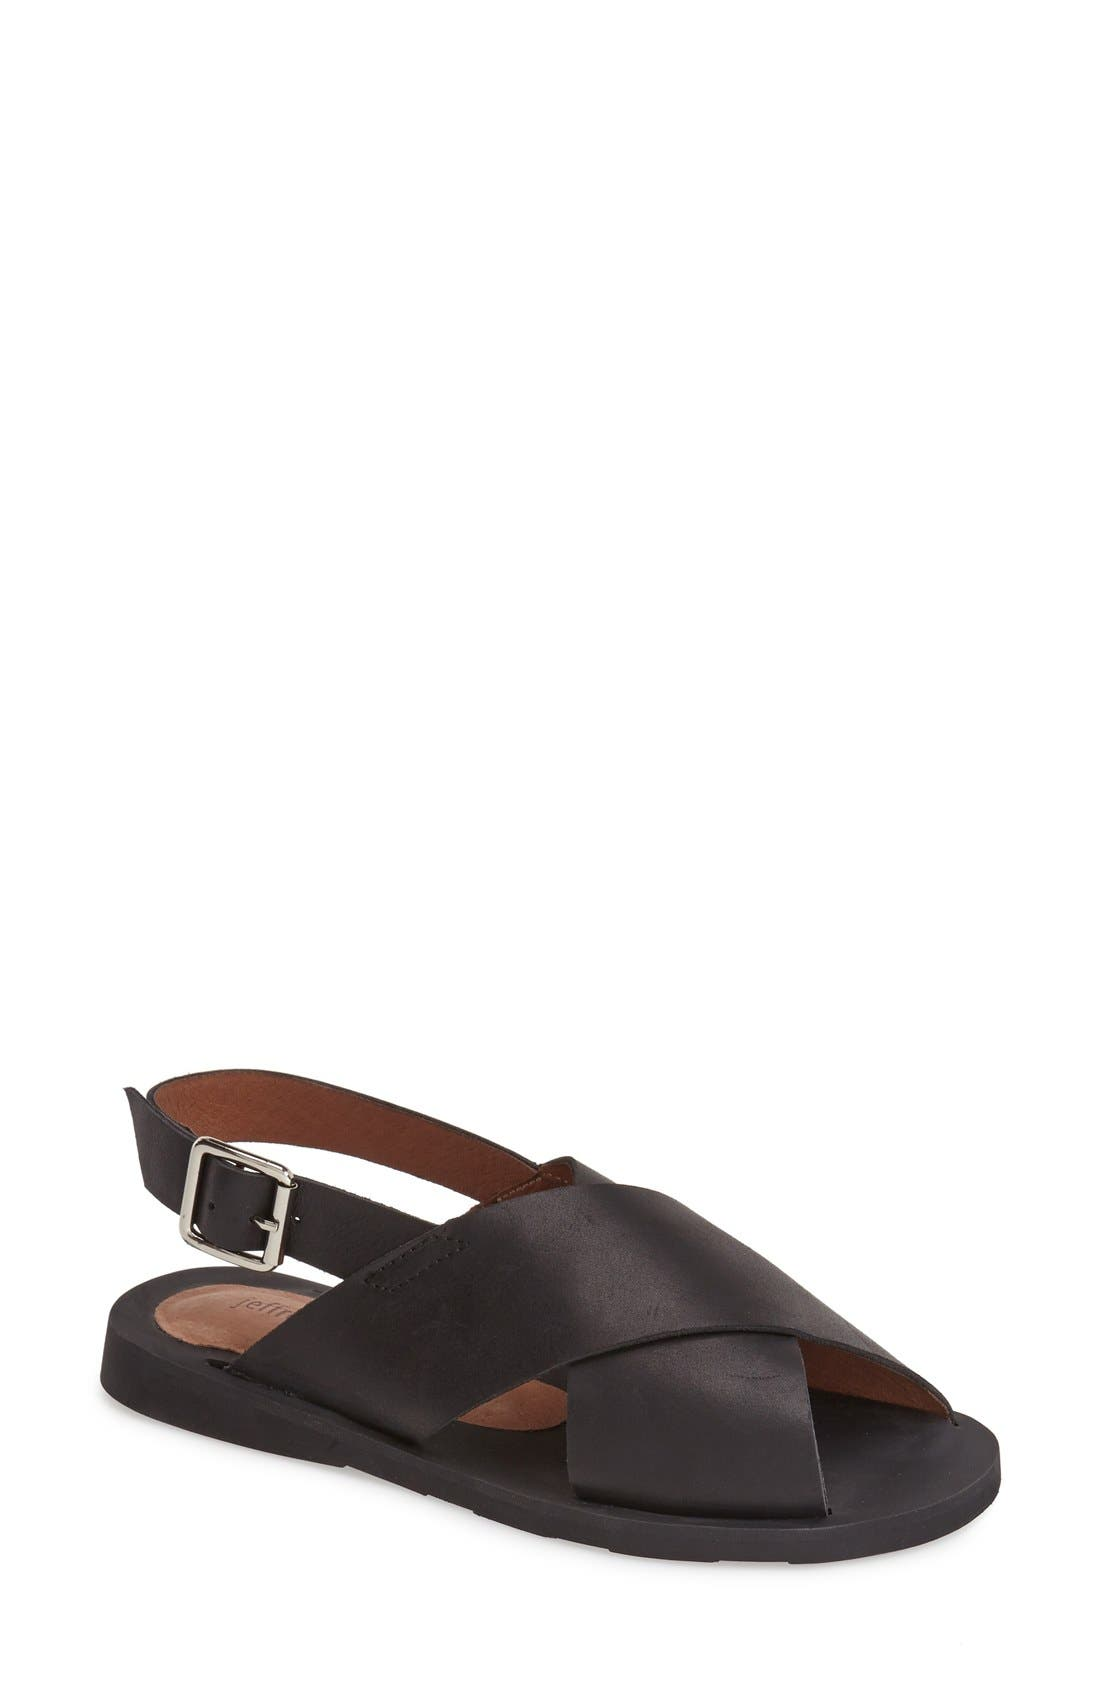 Main Image - Jeffrey Campbell 'Maldives' Leather Sandal (Women)